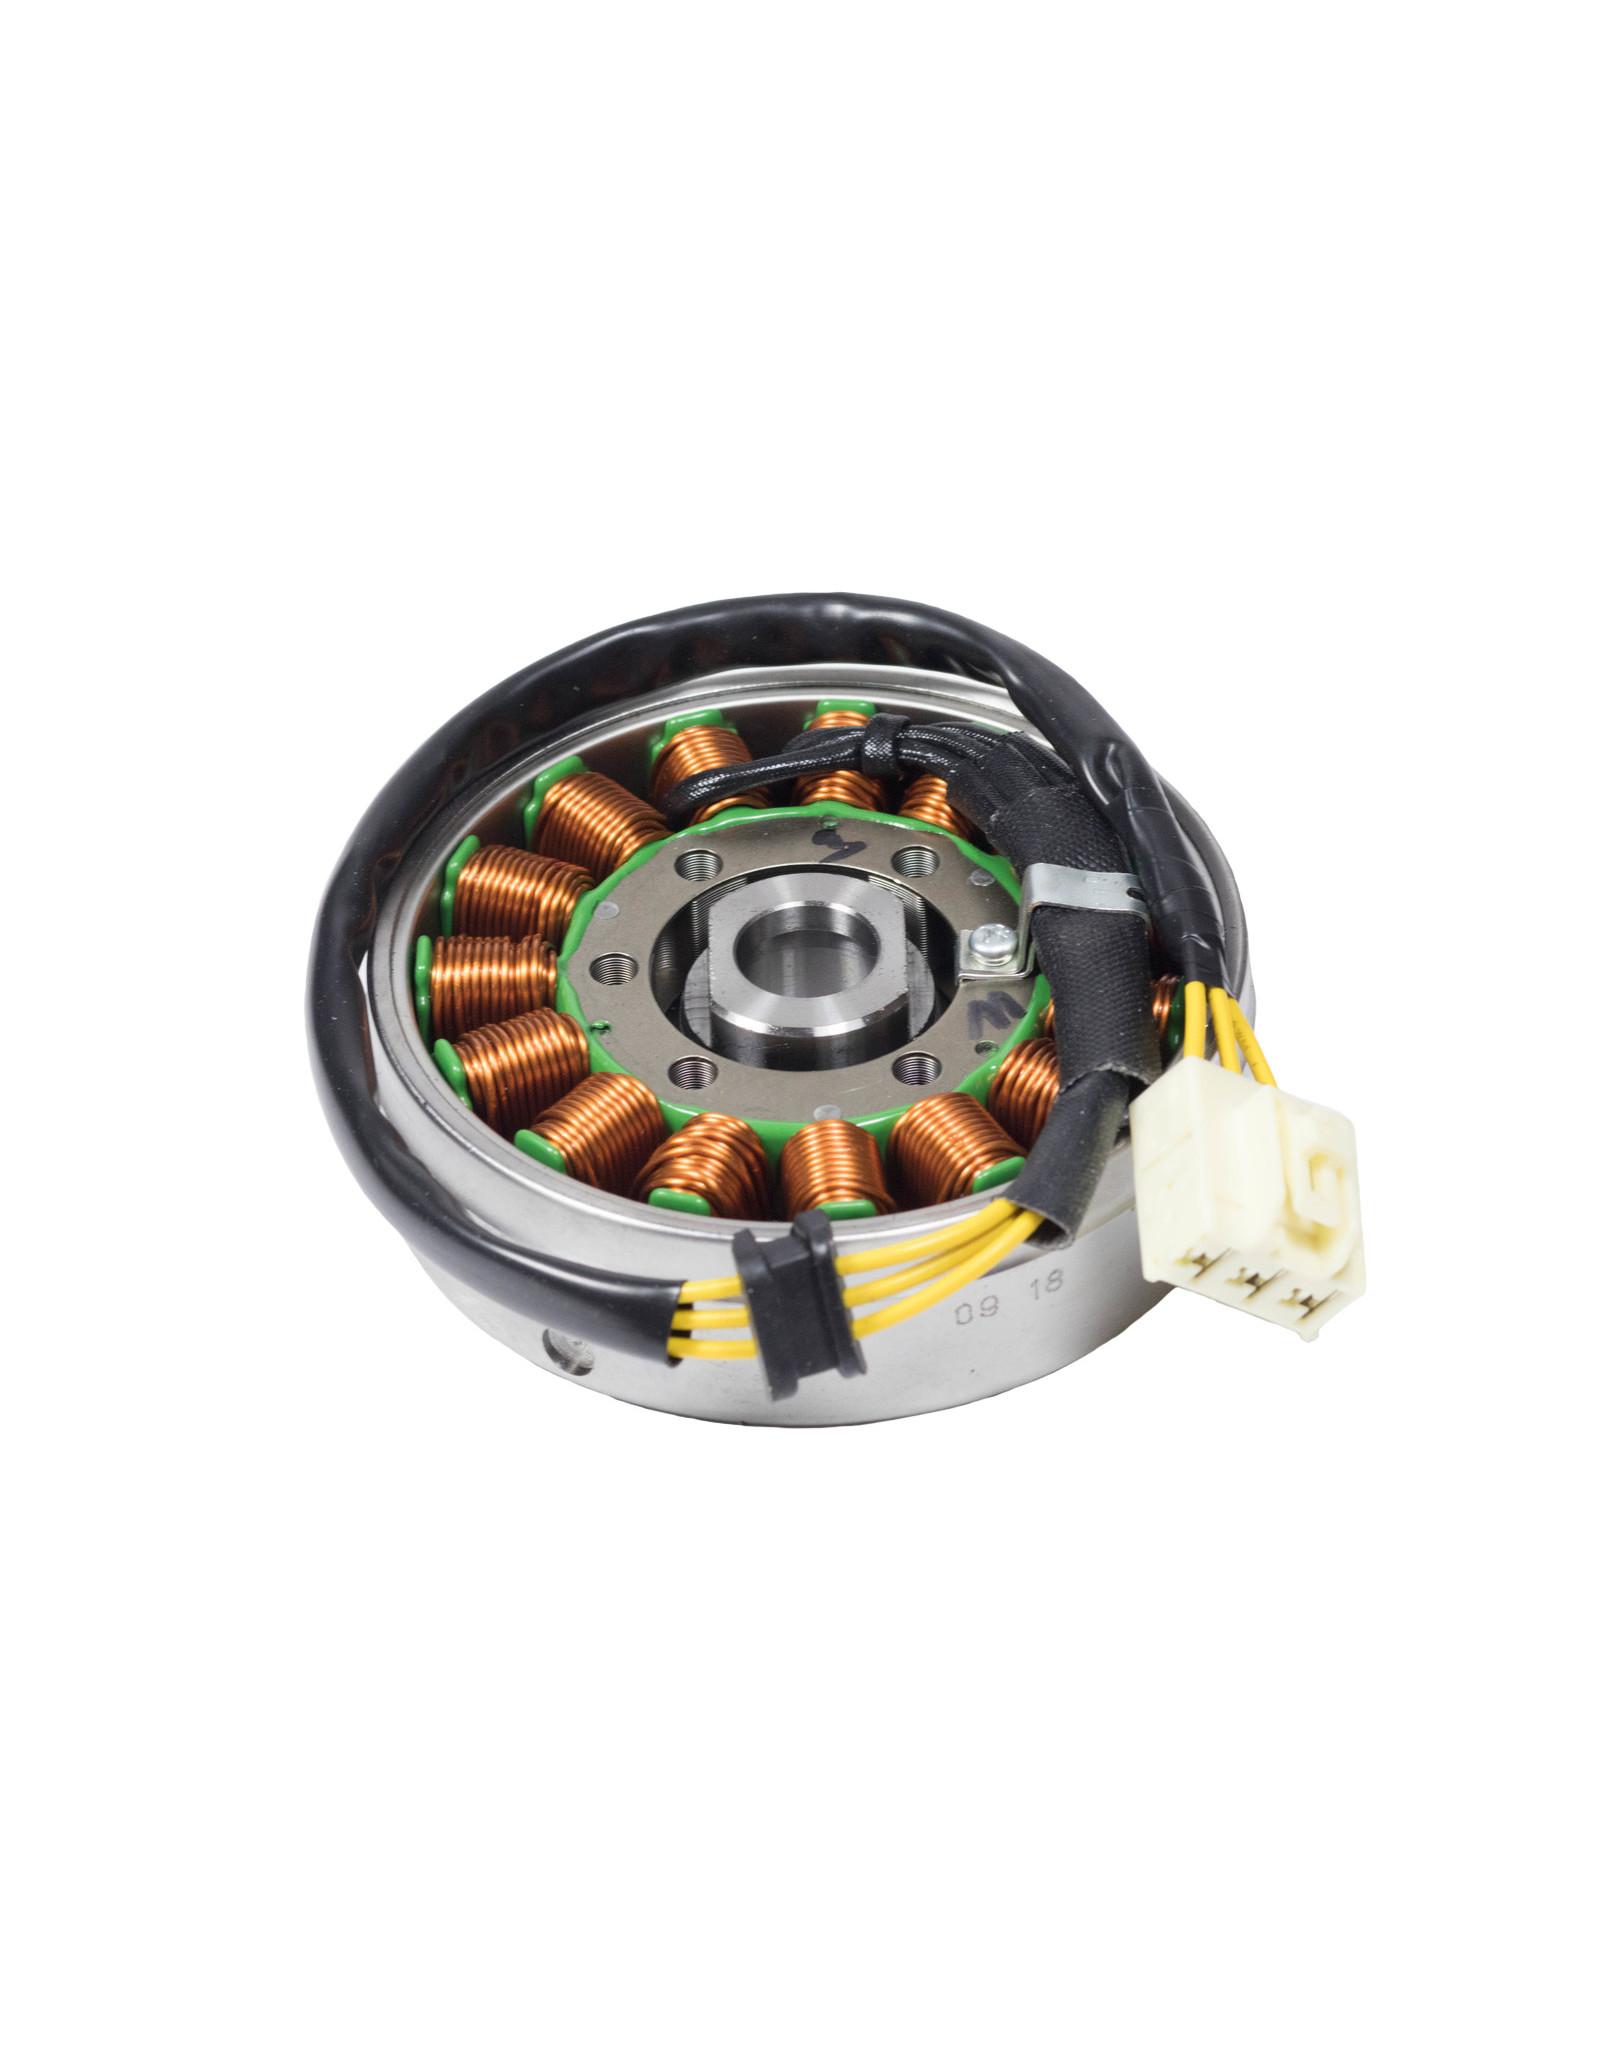 Generator - Updated V4 RSV4 / Tuono  1a010574